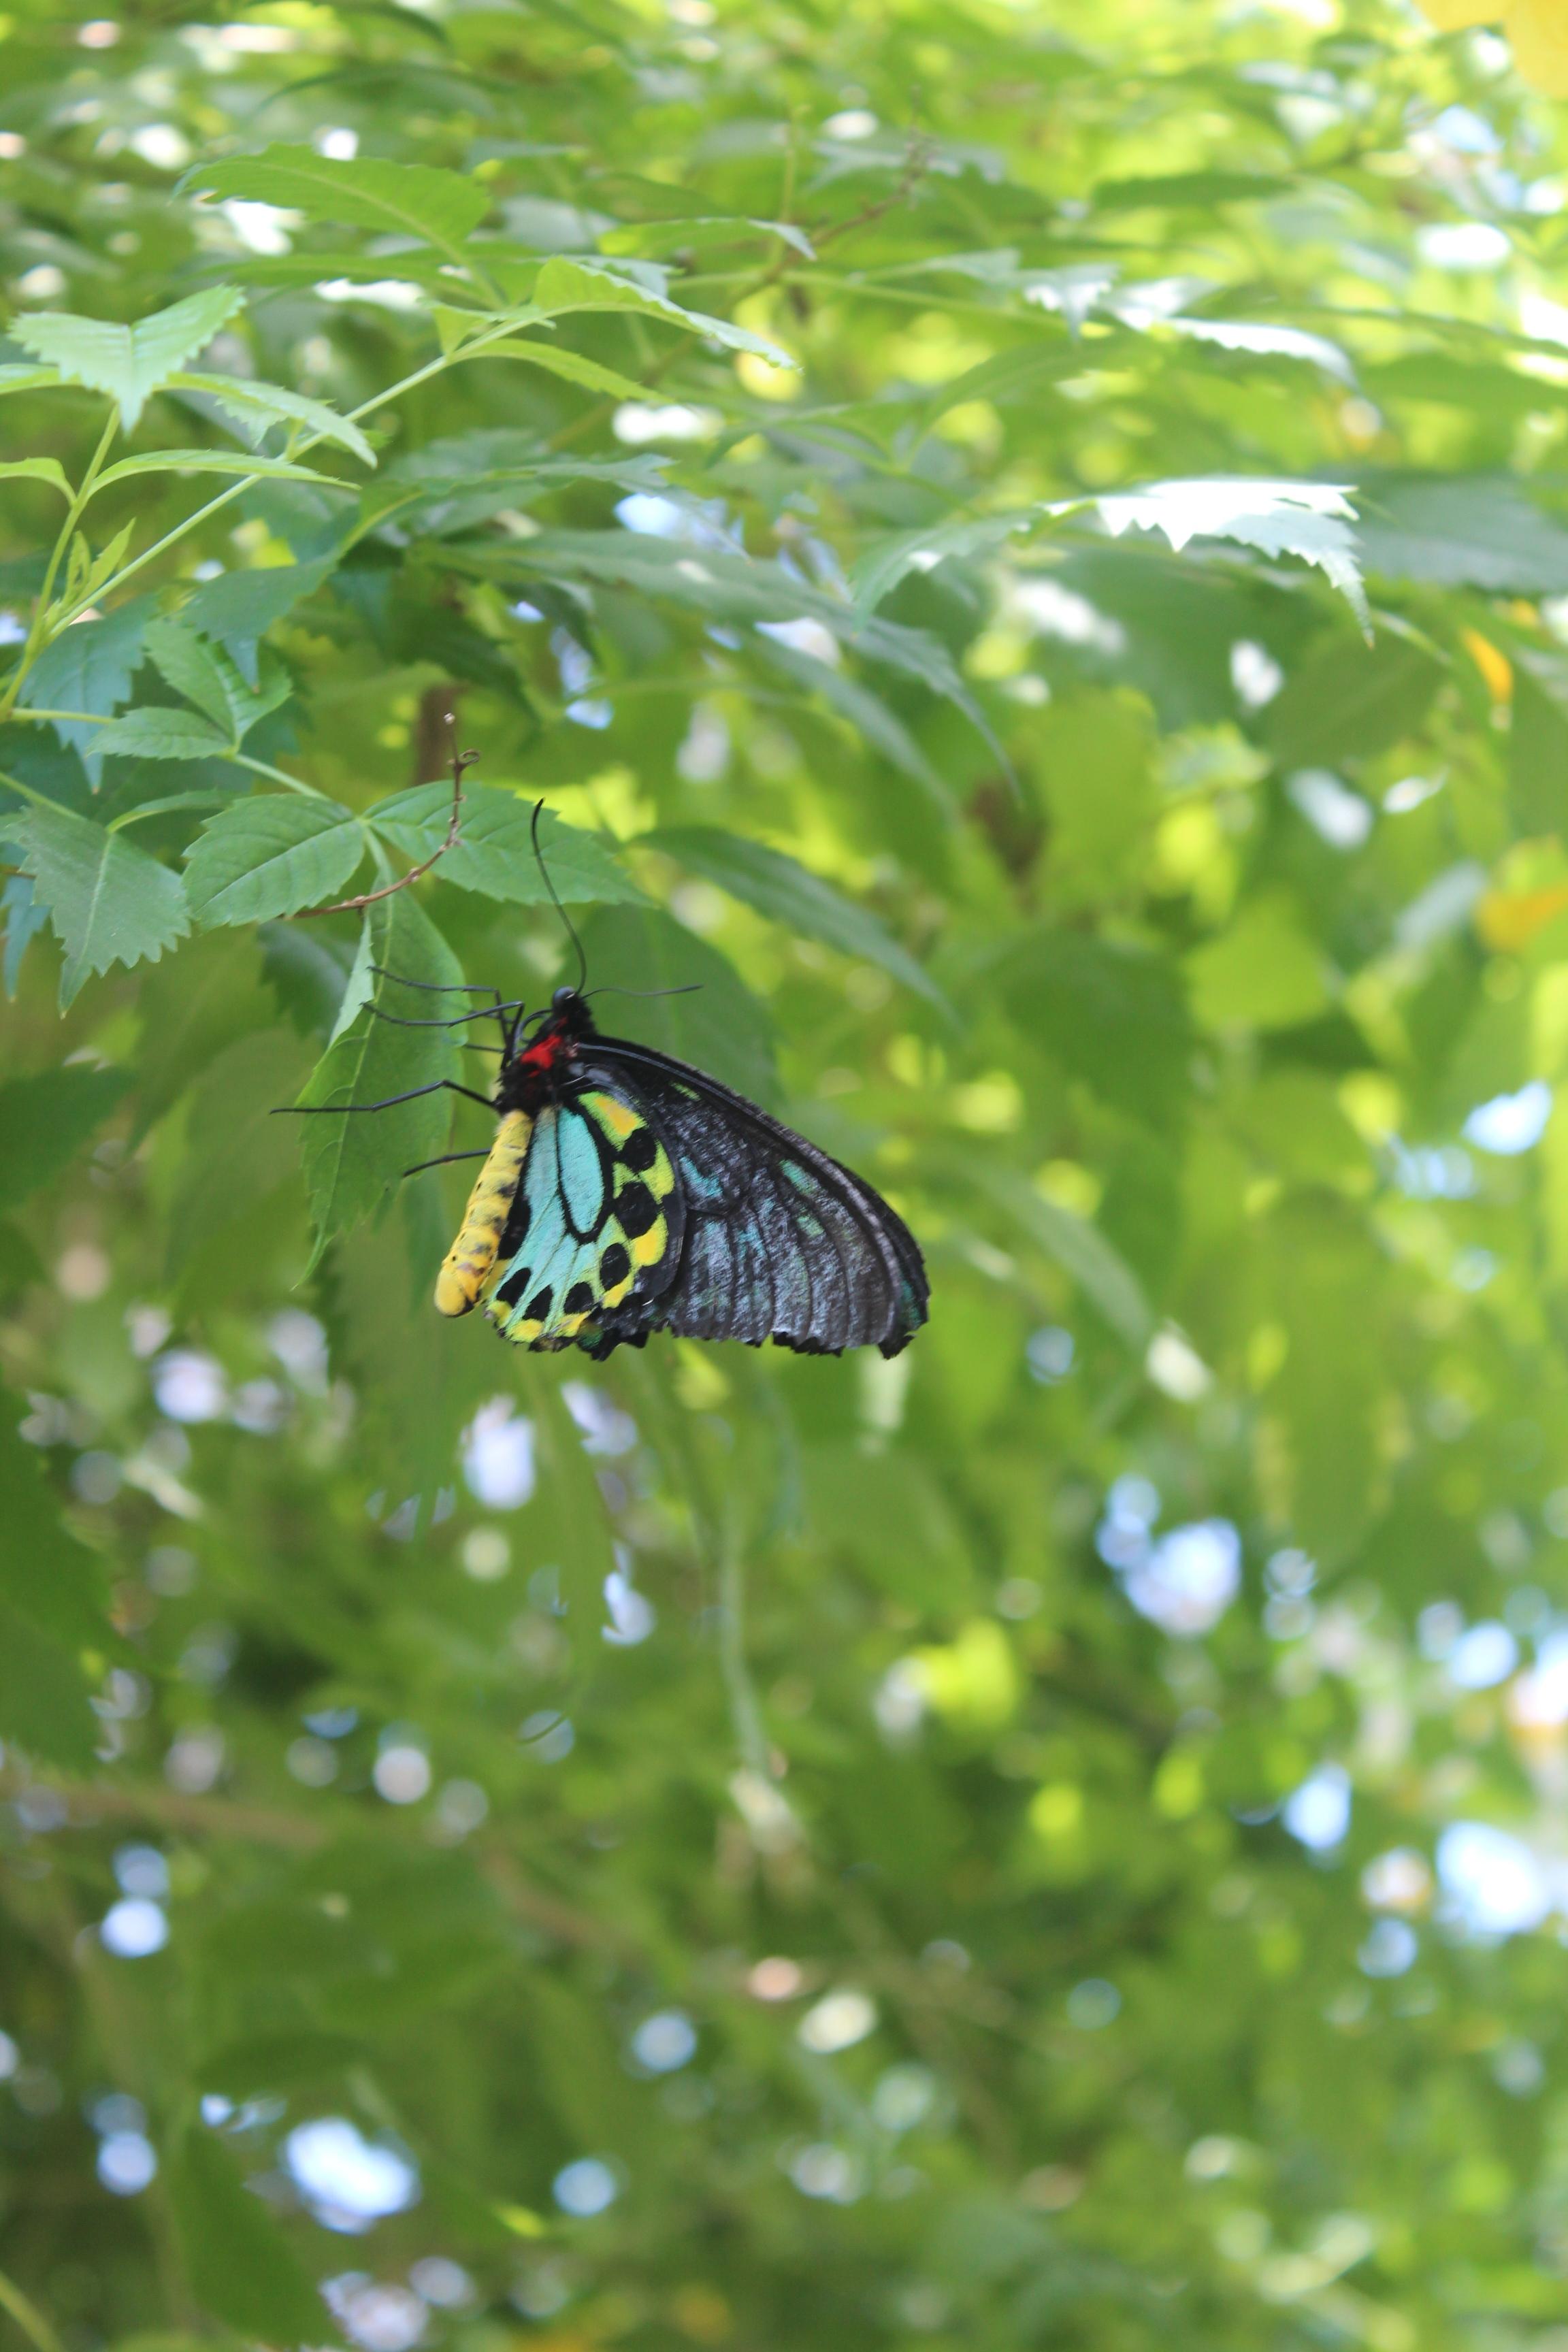 kw-butterfly-closeup-2